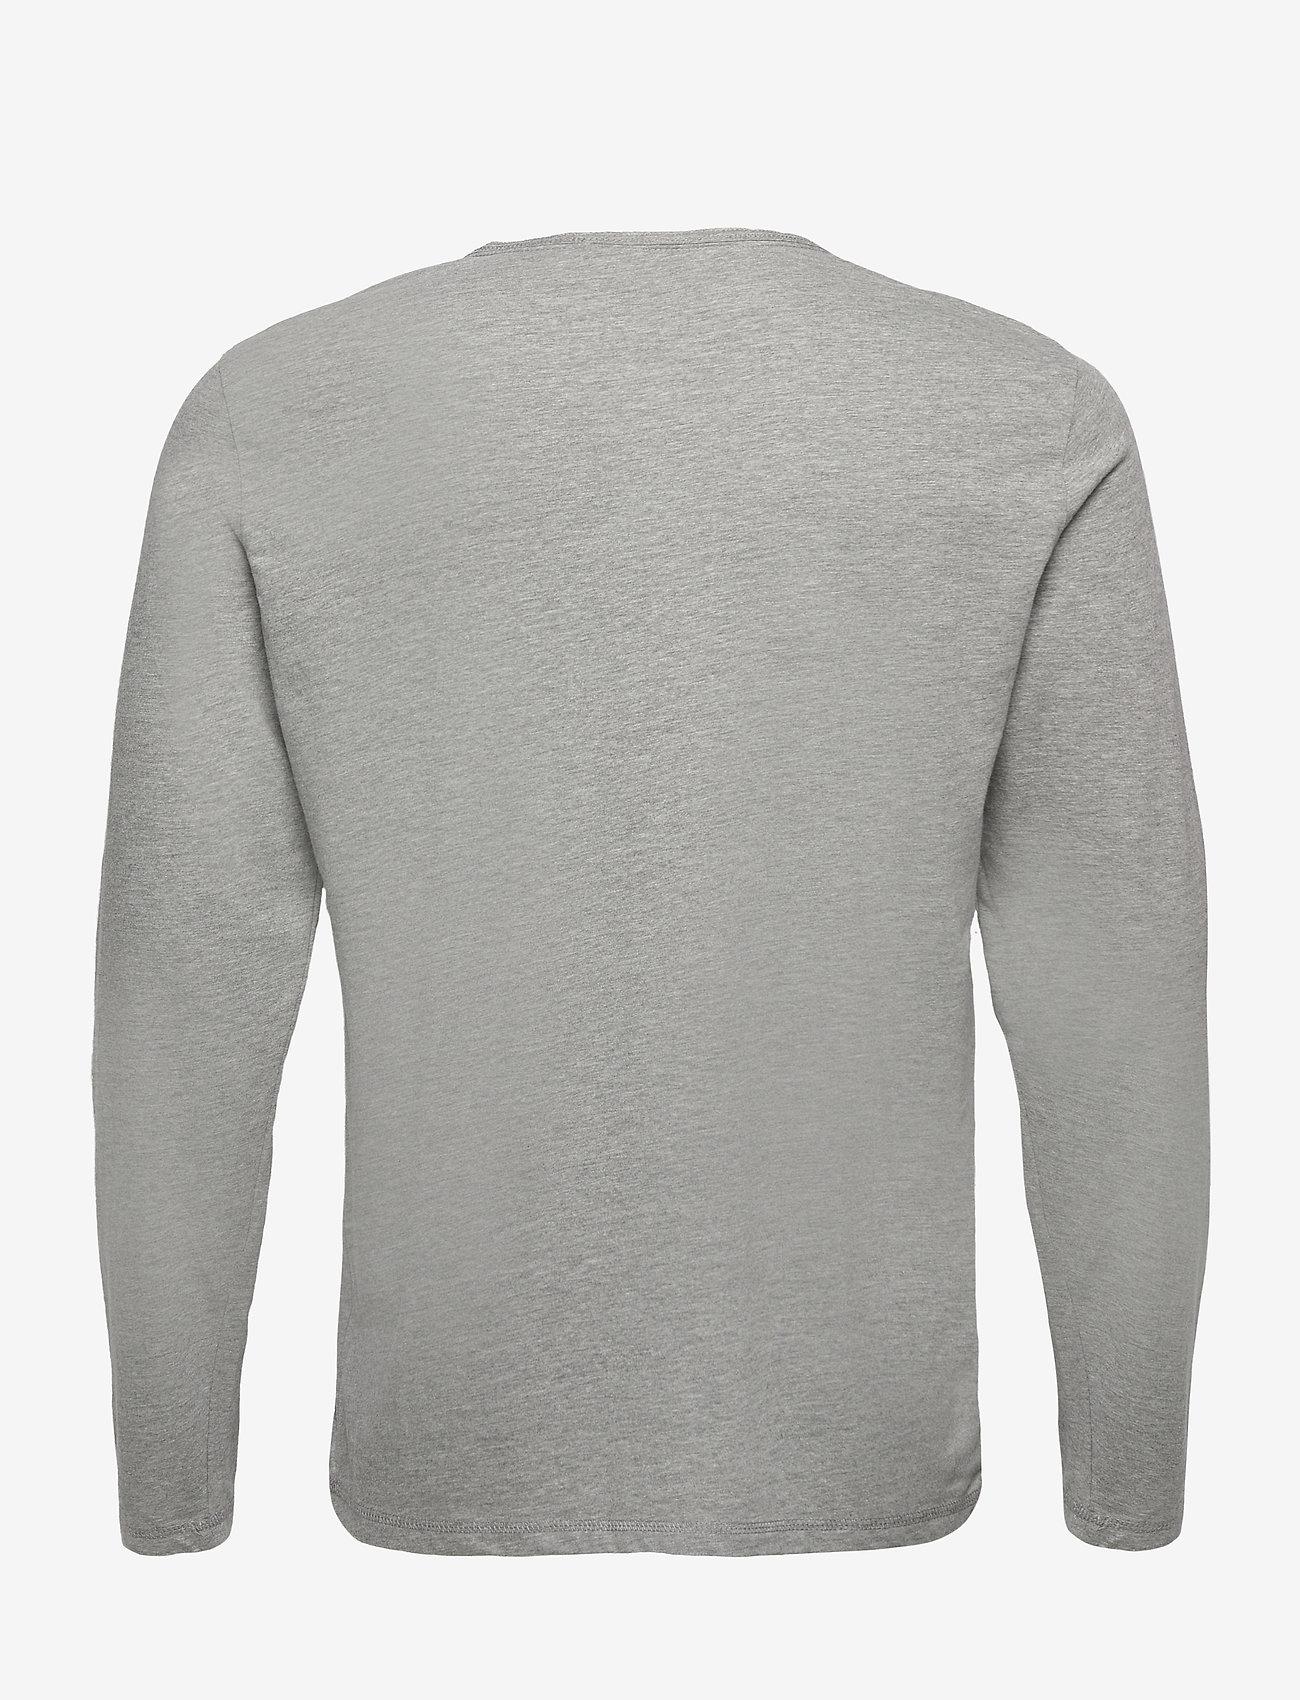 Blend - Tee - t-shirts basiques - stone mix - 1